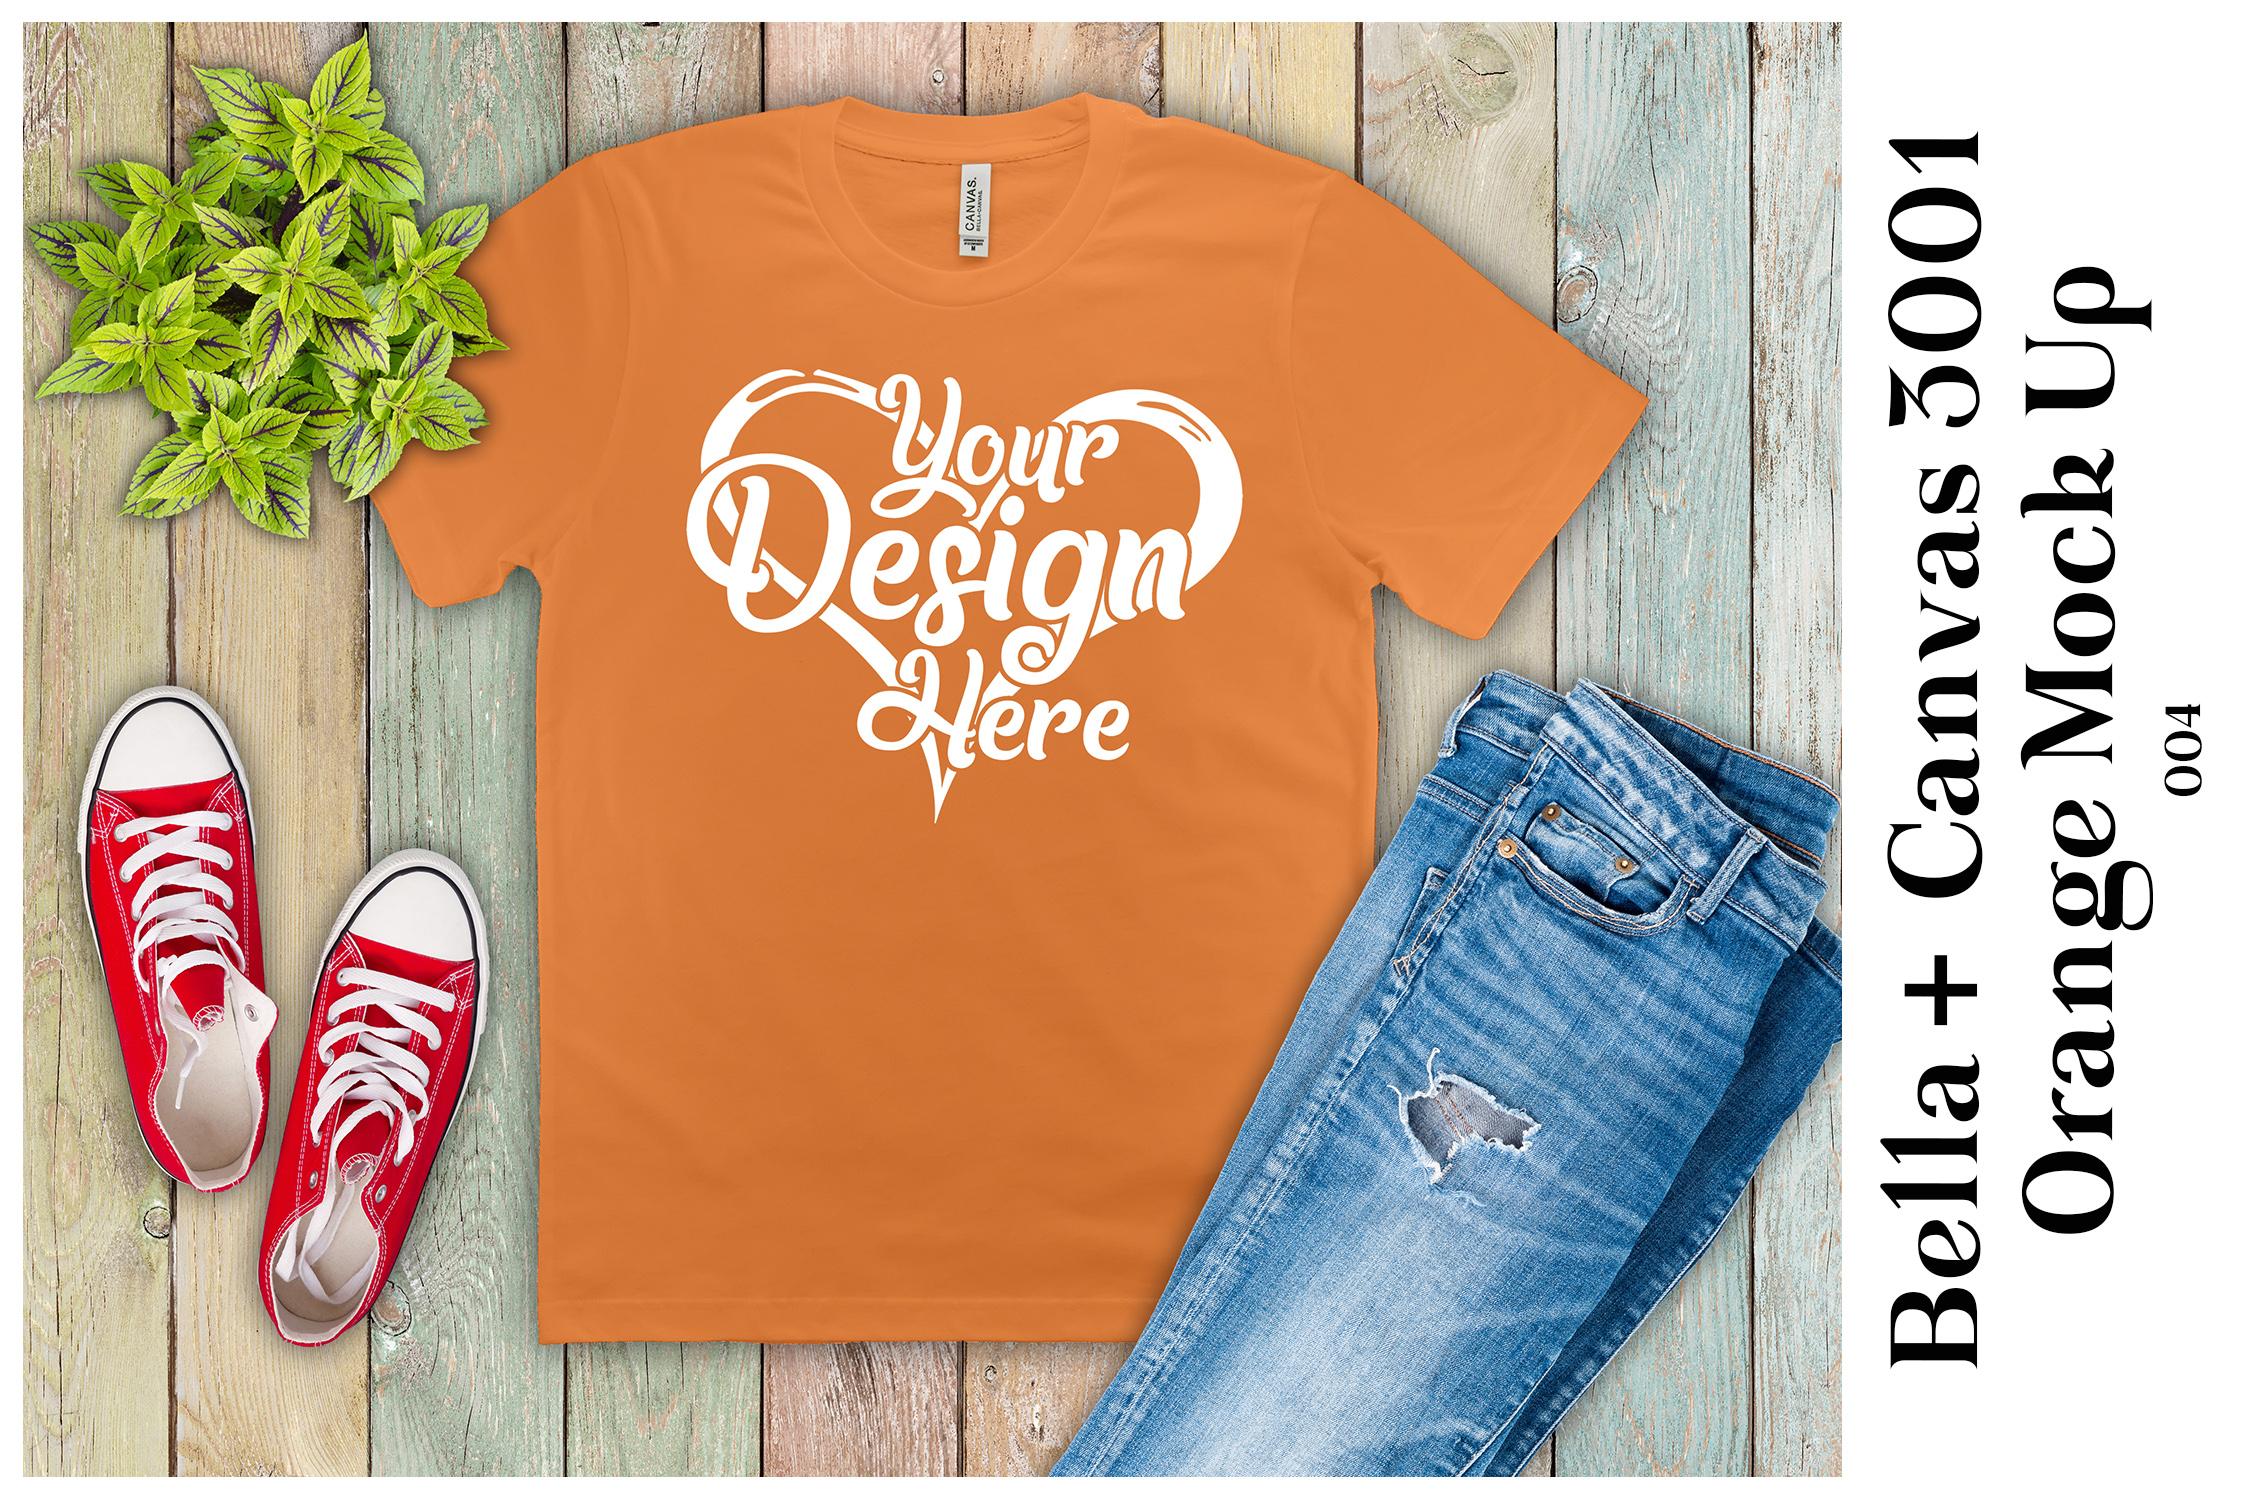 Mens T-Shirt Mockup Orange Bella Canvas 3001 Mock up example image 1